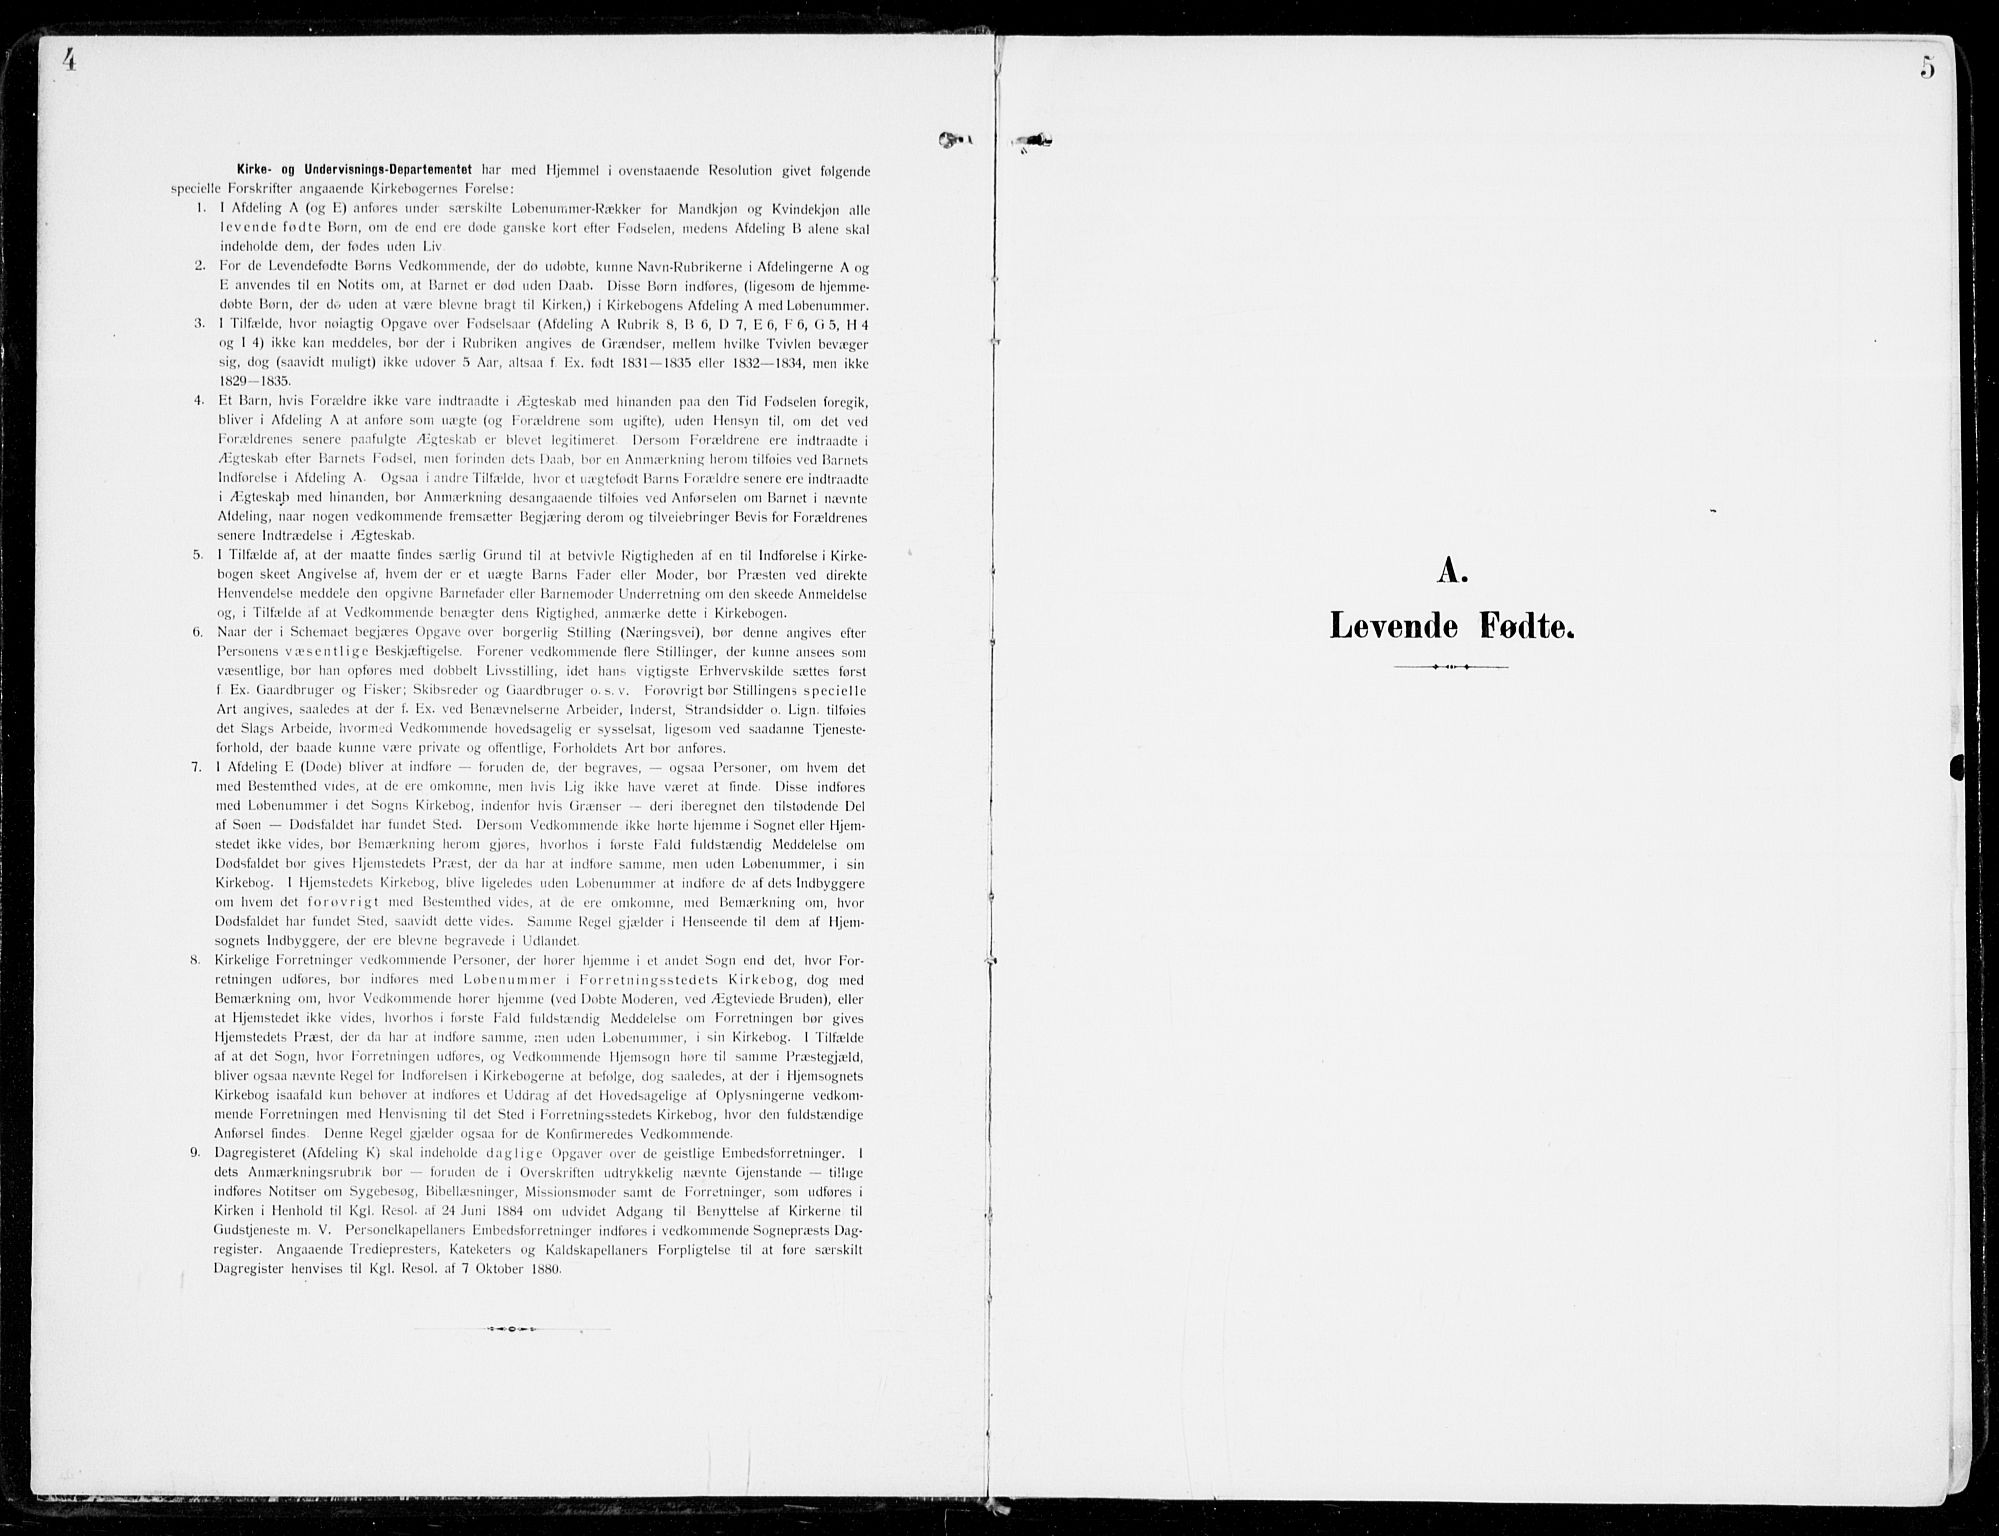 SAKO, Sem kirkebøker, F/Fb/L0006: Ministerialbok nr. II 6, 1905-1918, s. 4-5